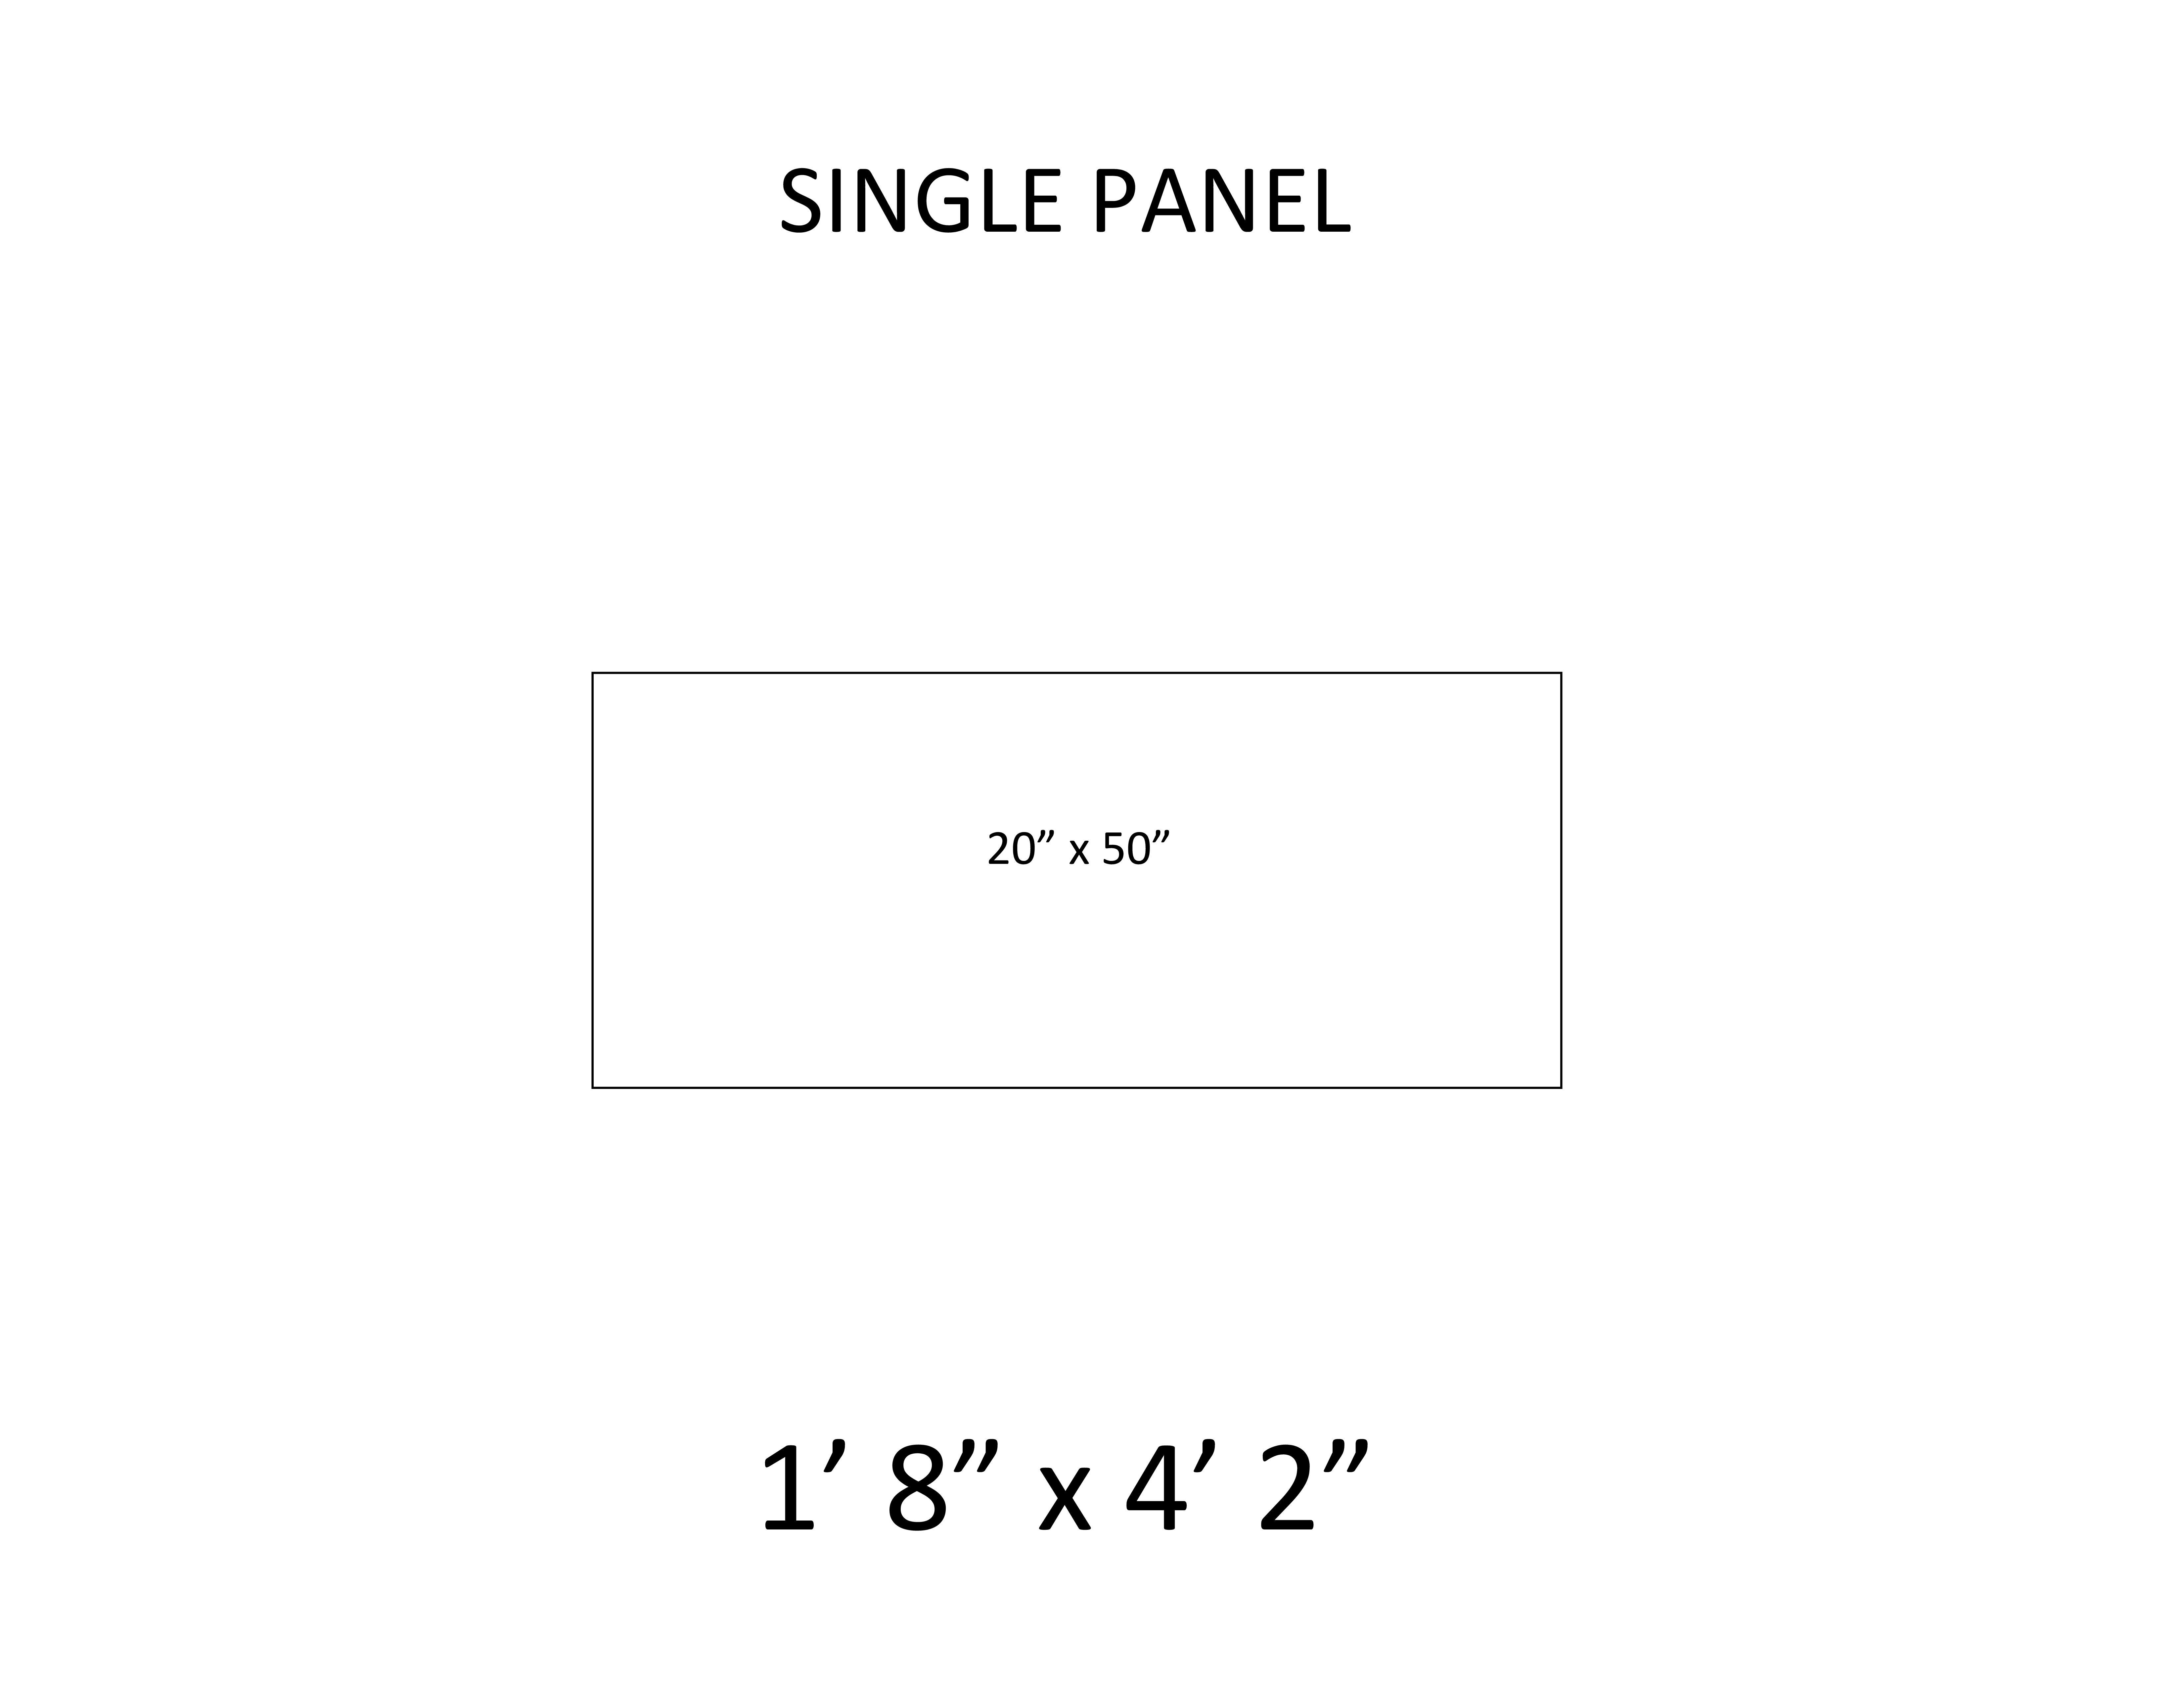 5 - Single Panel